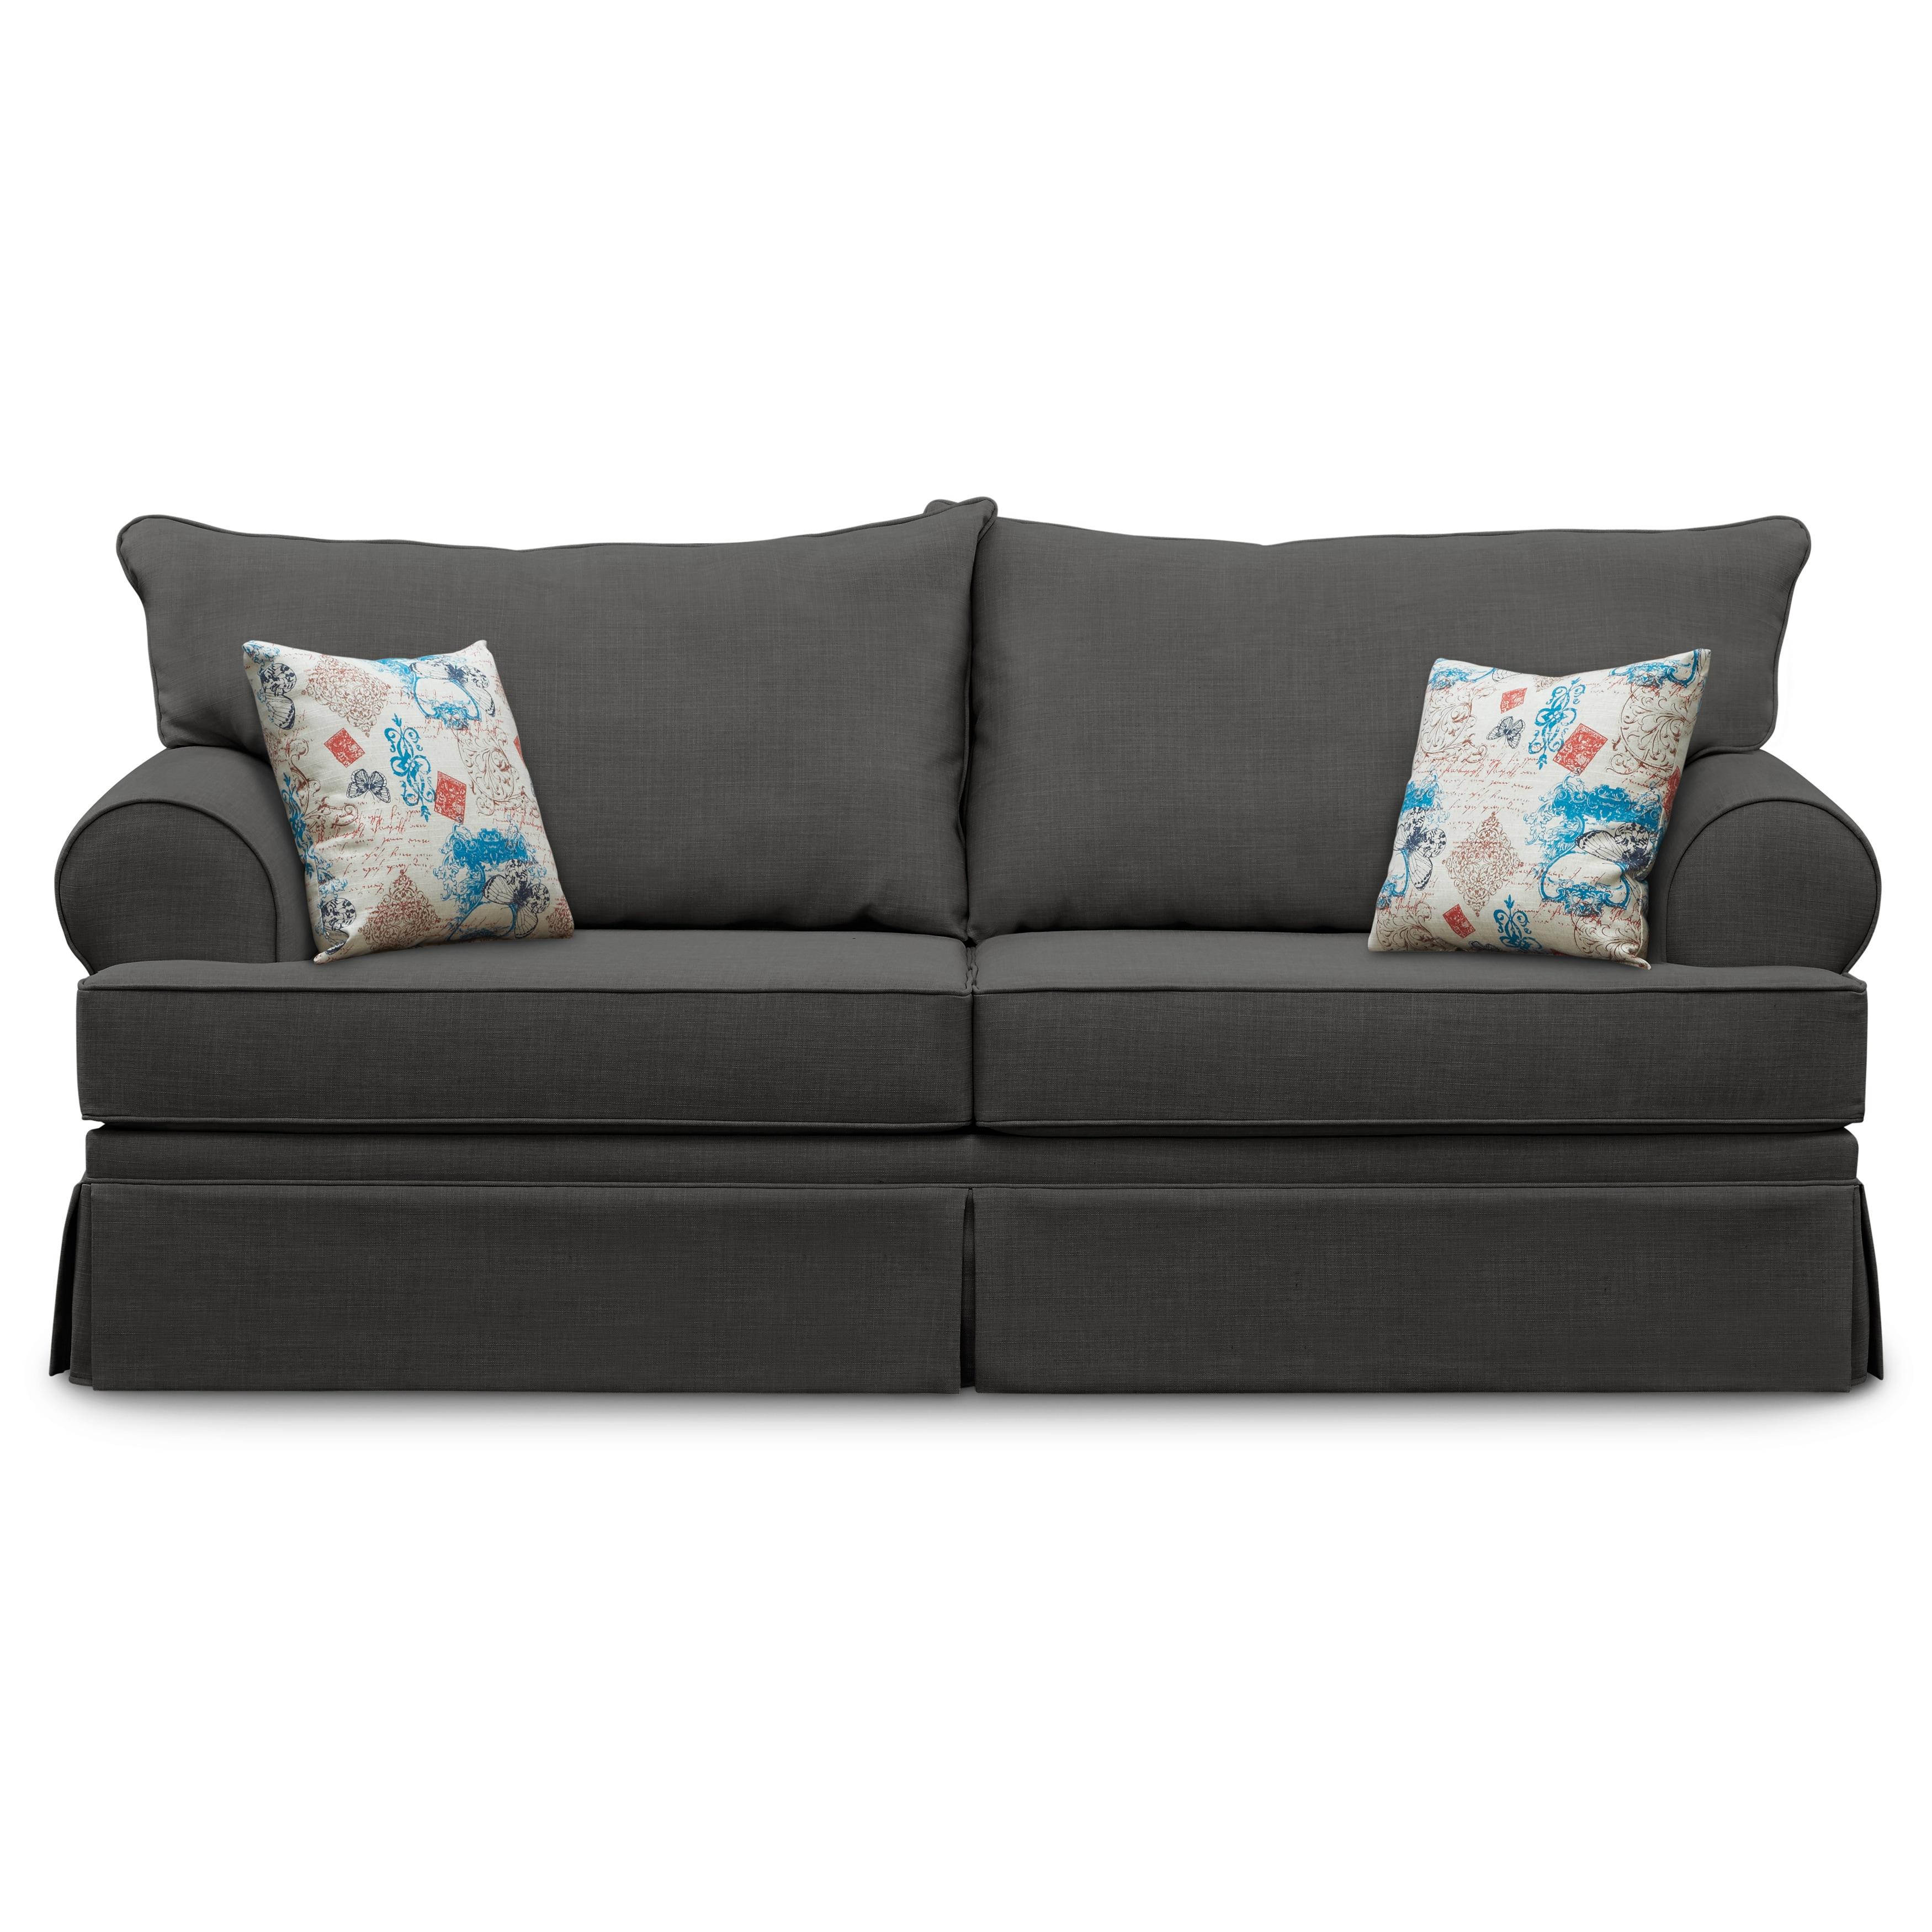 Art Van Olympia Charcoal Sofa 17102936 Shopping Great Deals On Sofas Loveseats